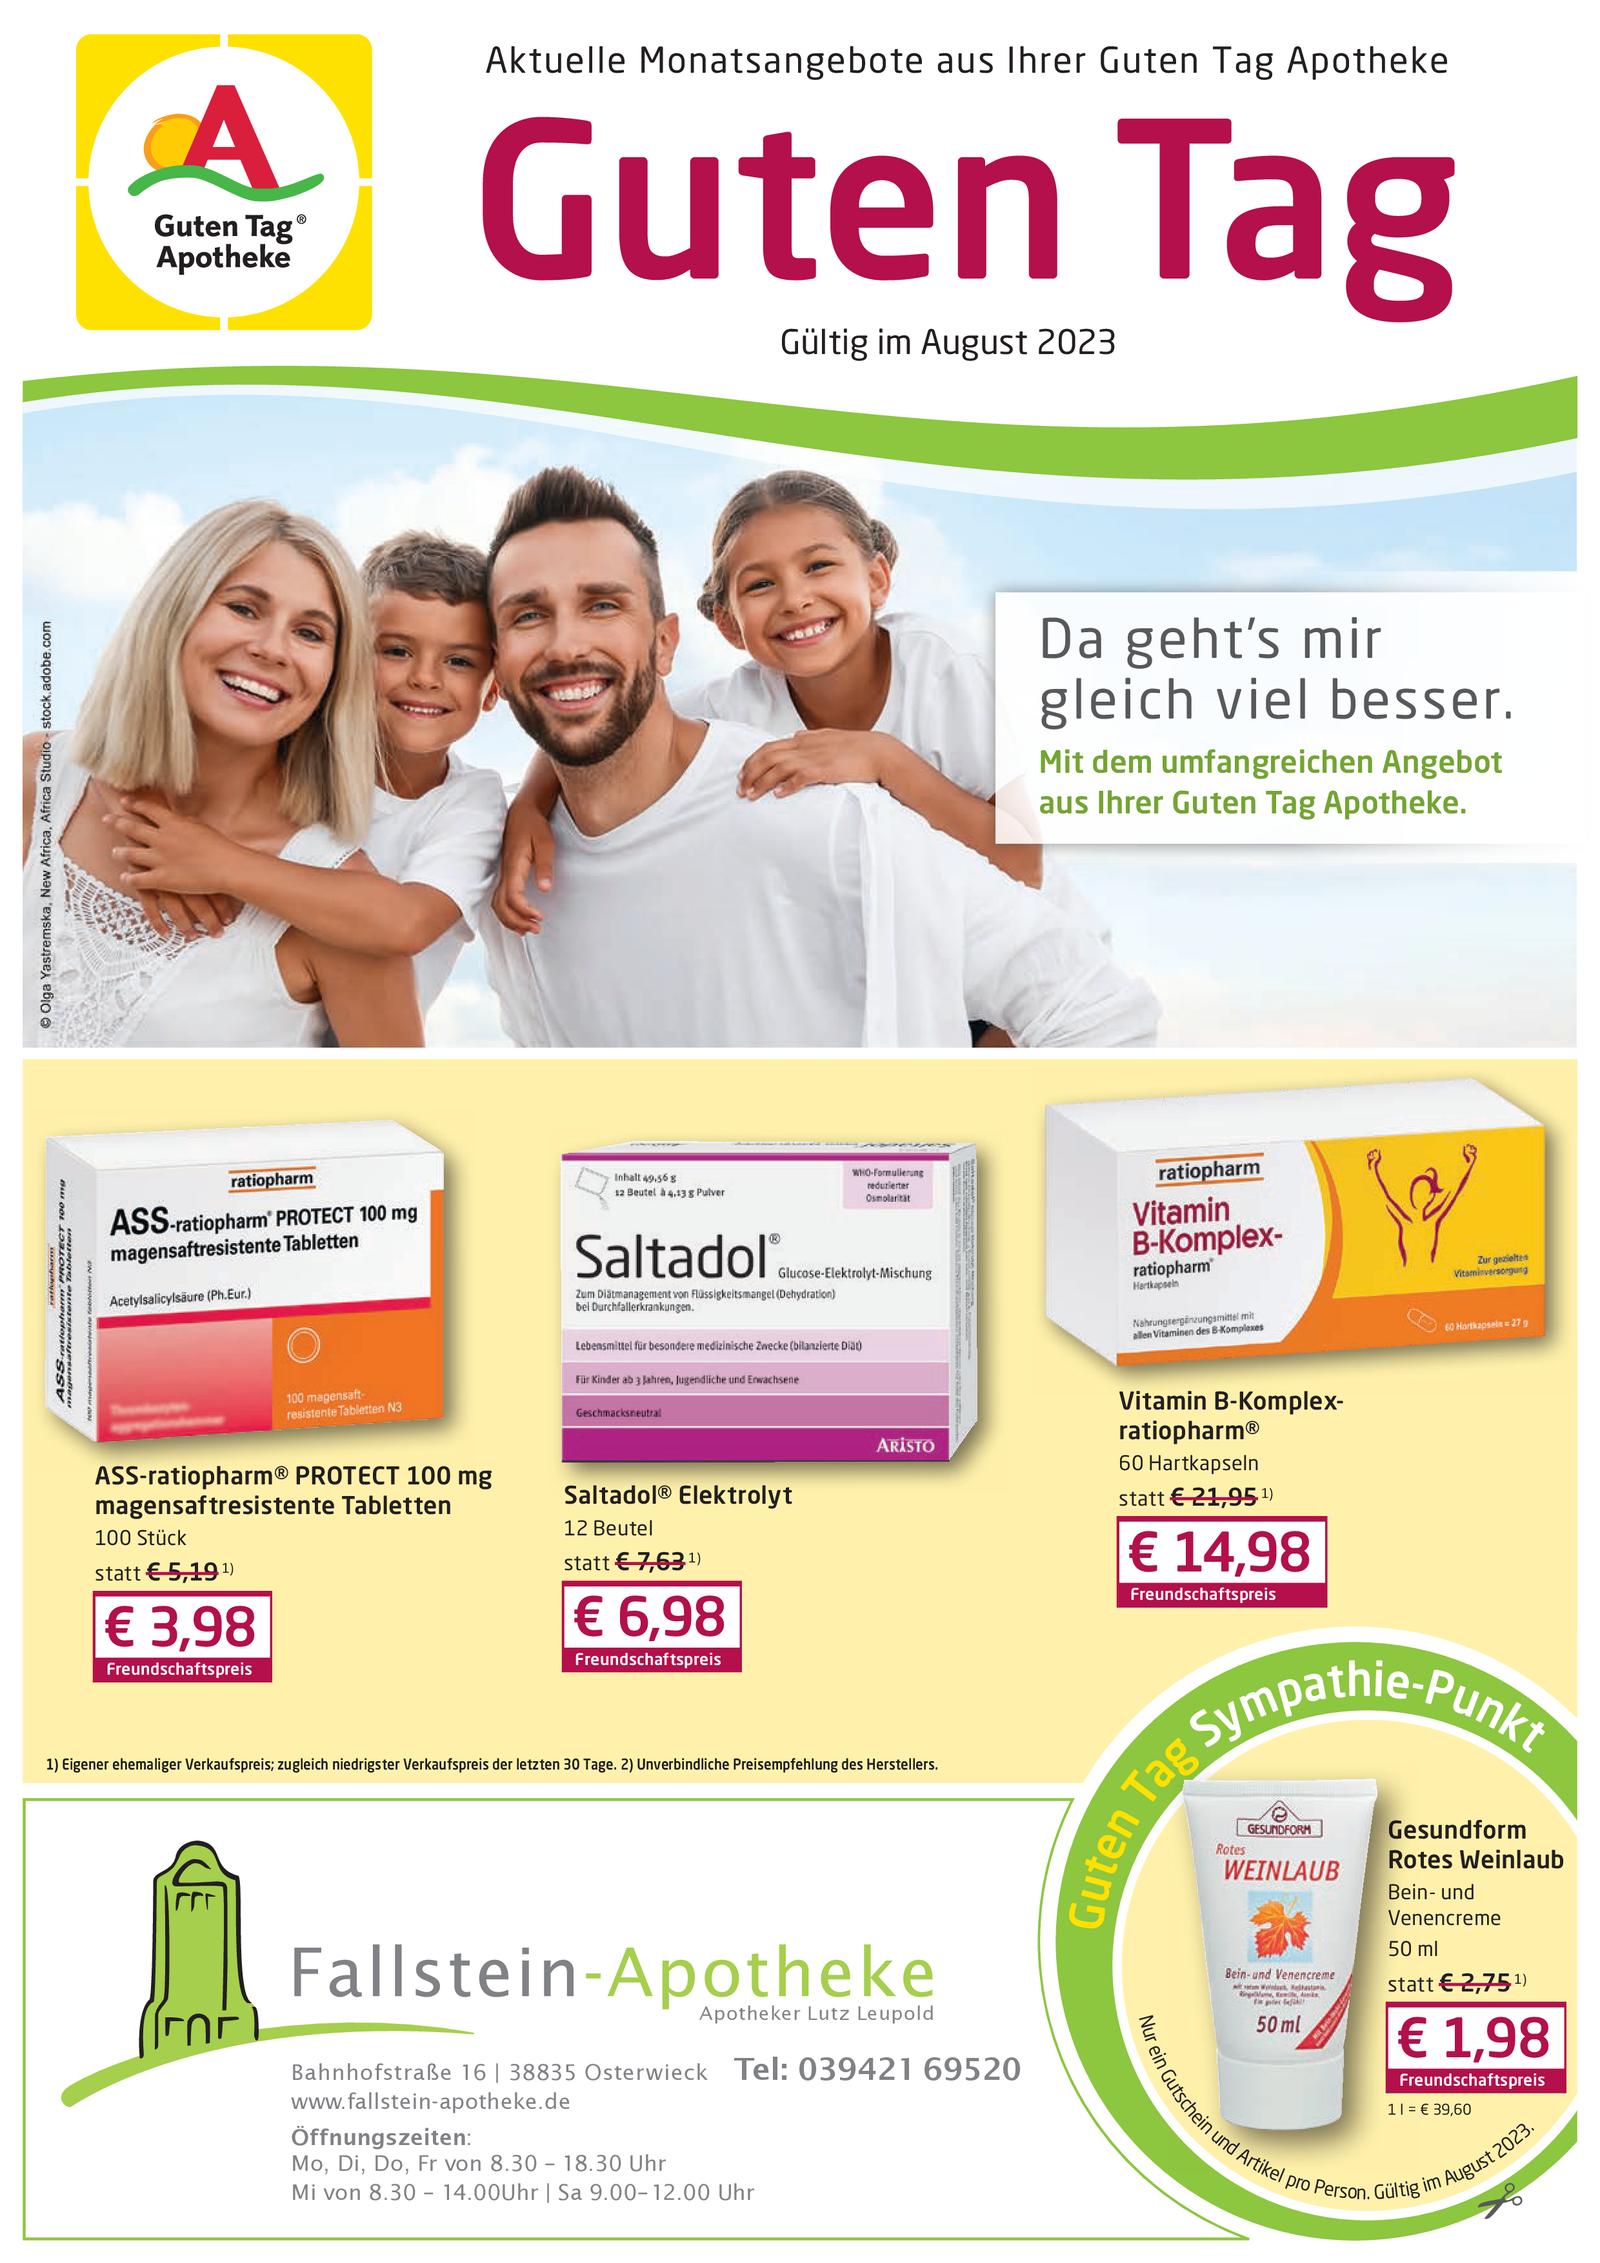 Angebot der Fallstein-Apotheke Osterwieck